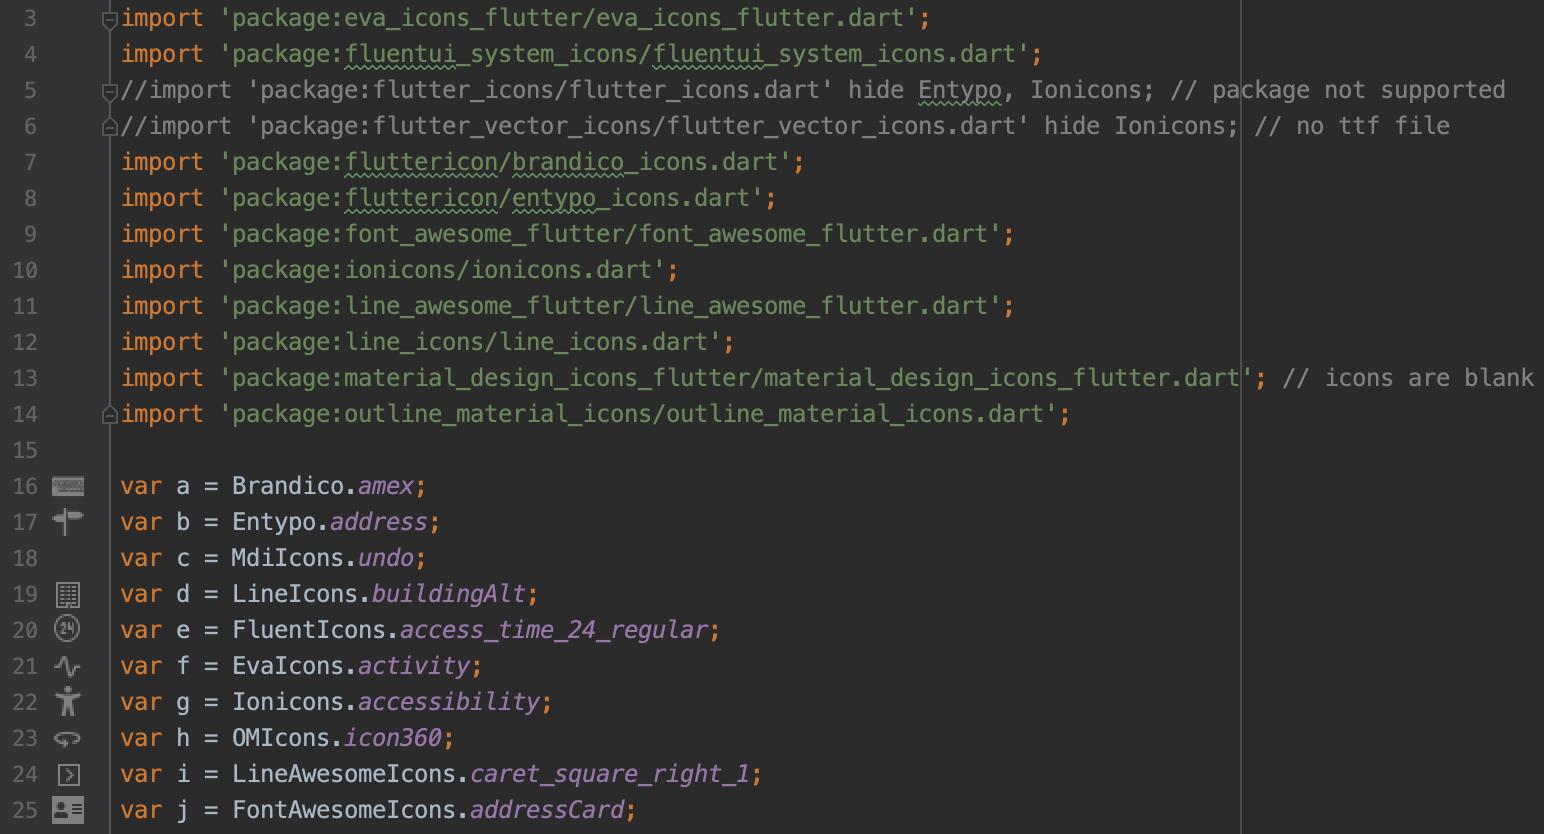 Icon preview in IntelliJ/Android Studio